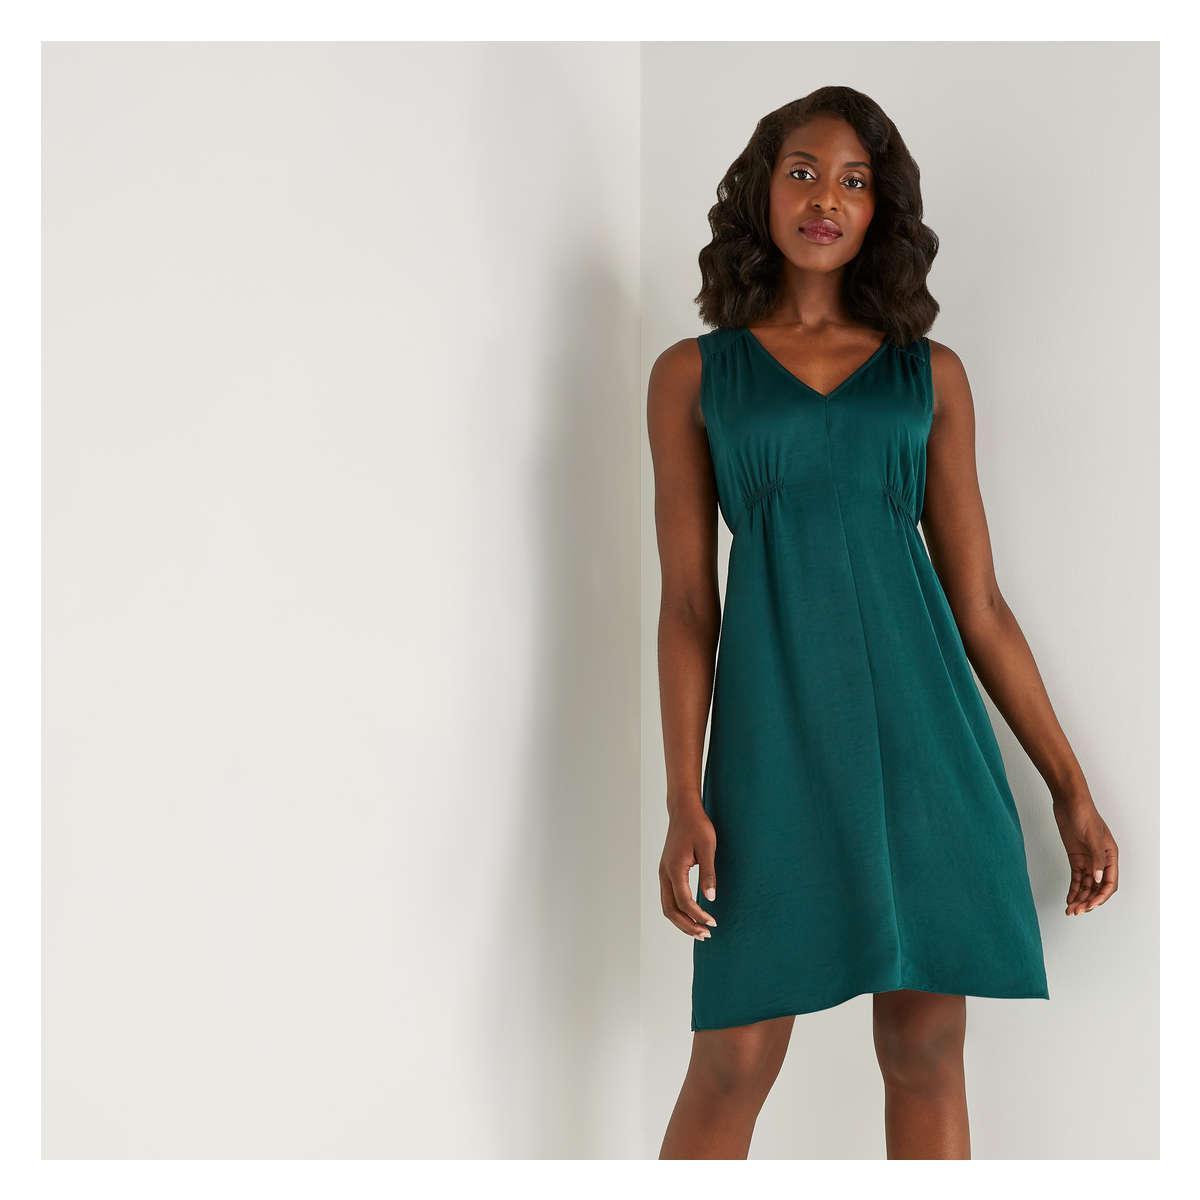 1aca4ad37321f Joe Fresh. Women s Hammered Satin Sleeveless Dress